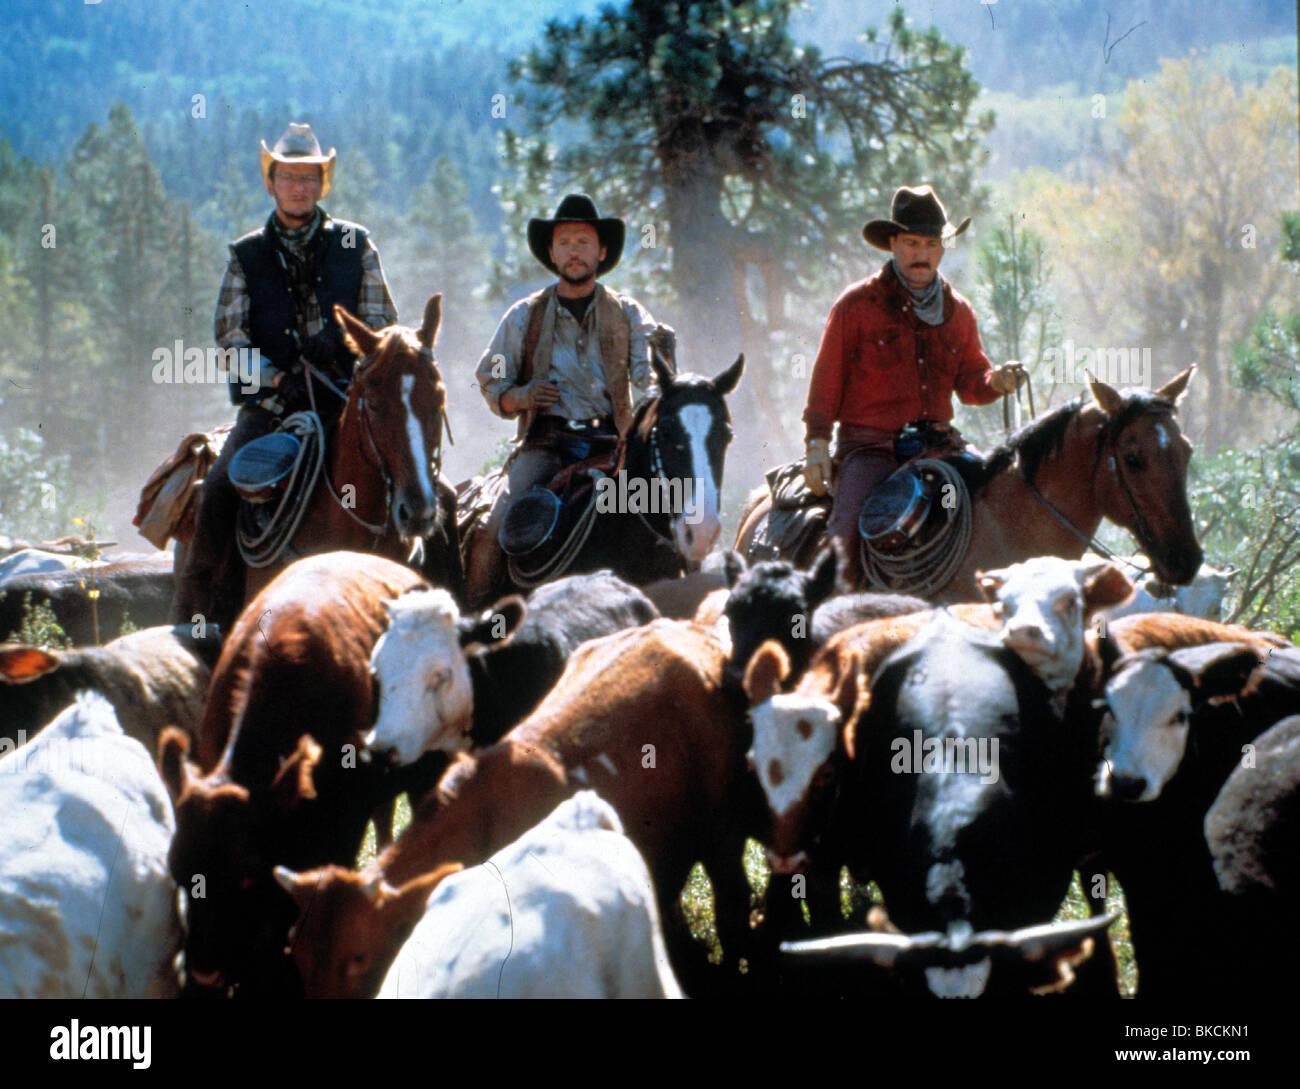 City Slickers 1991 Daniel Stern Billy Crystal Bruno Kirby Cts 019 Stock Photo Alamy